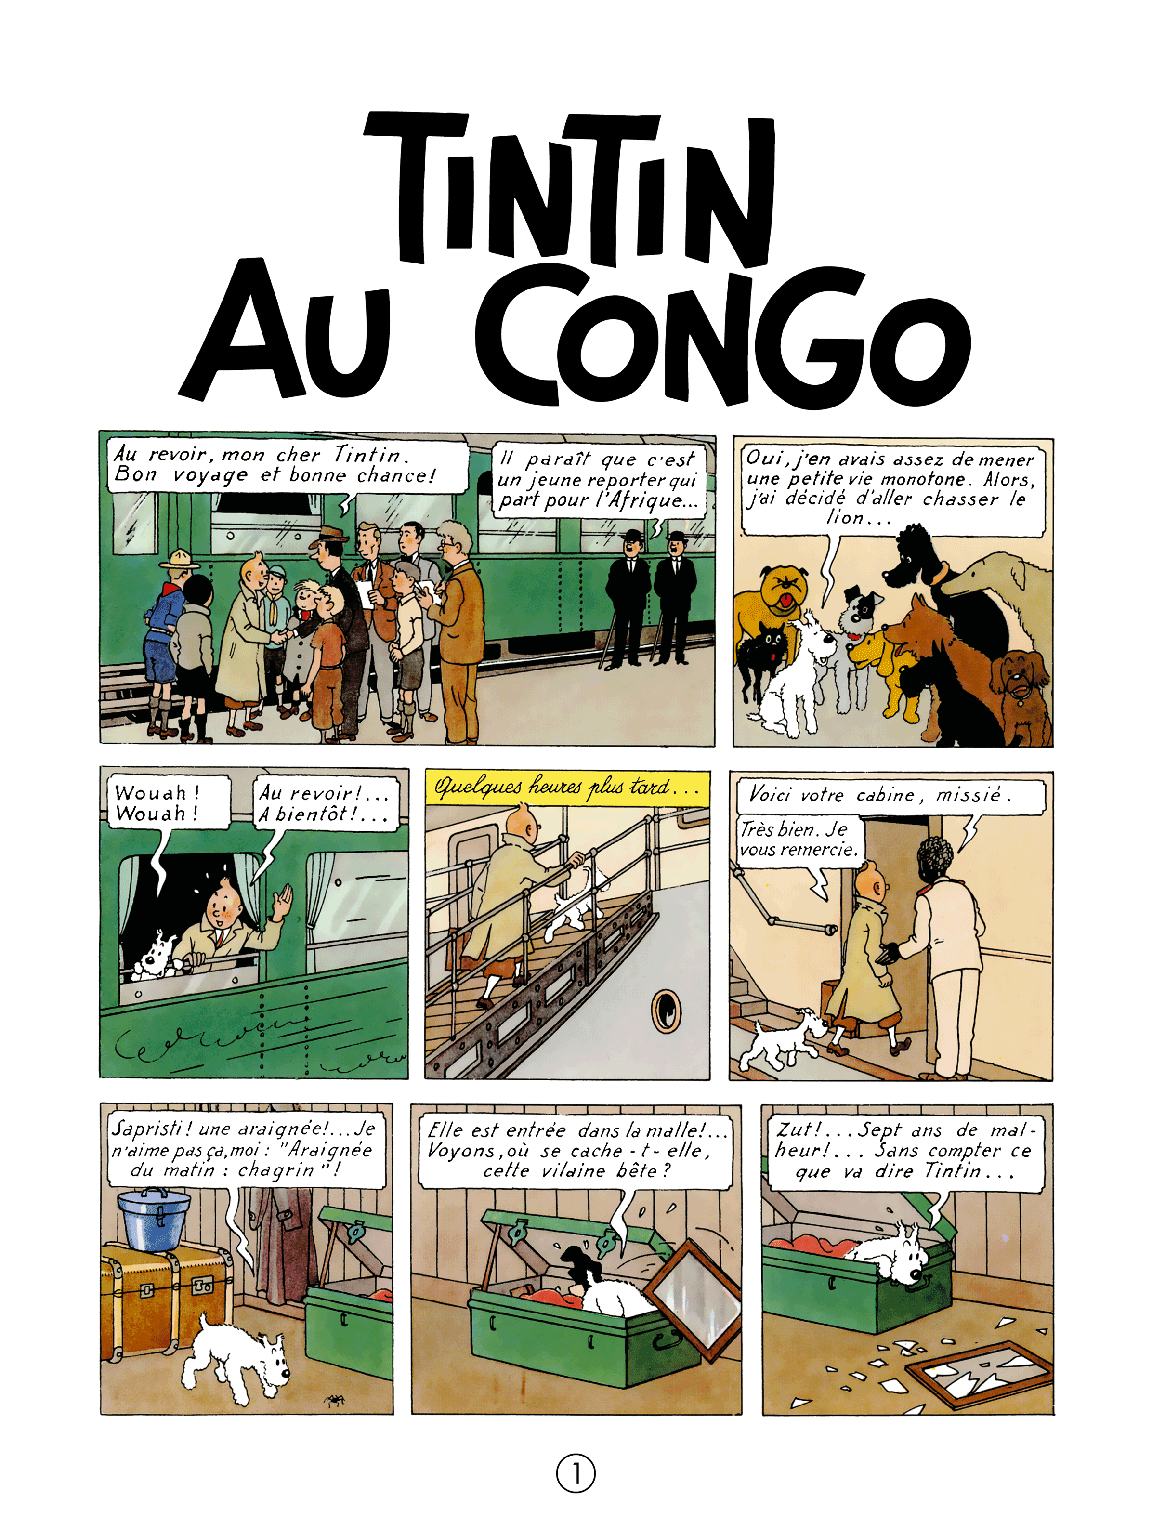 Tintin au Congo - page 1